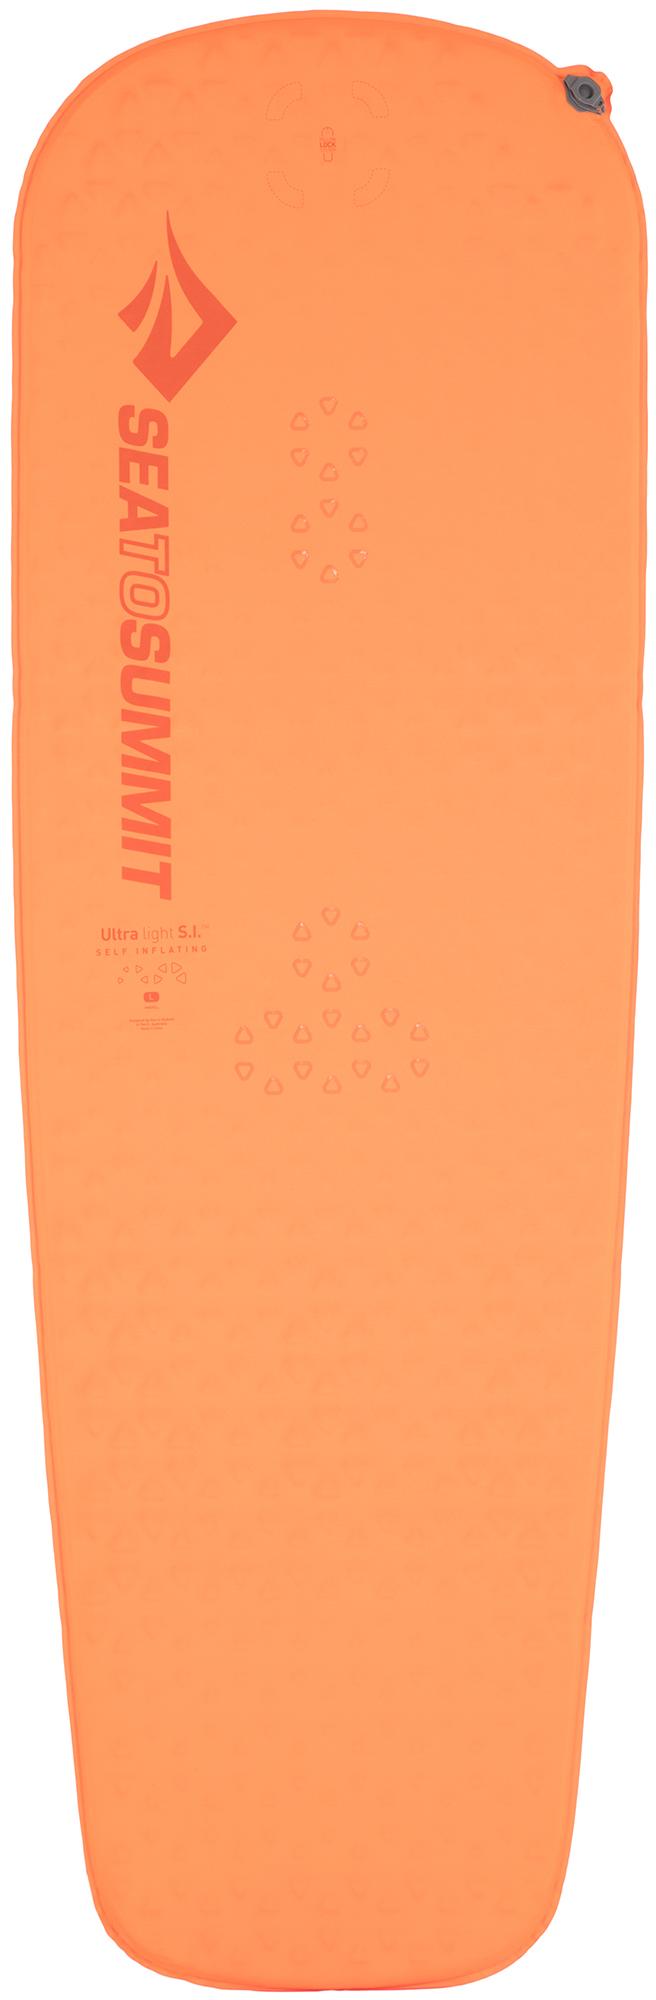 SEA TO SUMMIT Коврик самонадувающийся SEA TO SUMMIT UltraLight Self Inflating Mat Large комплектующие для спортивных сумок sea to summit 56928afrb25spp 2015 afrb25srpp